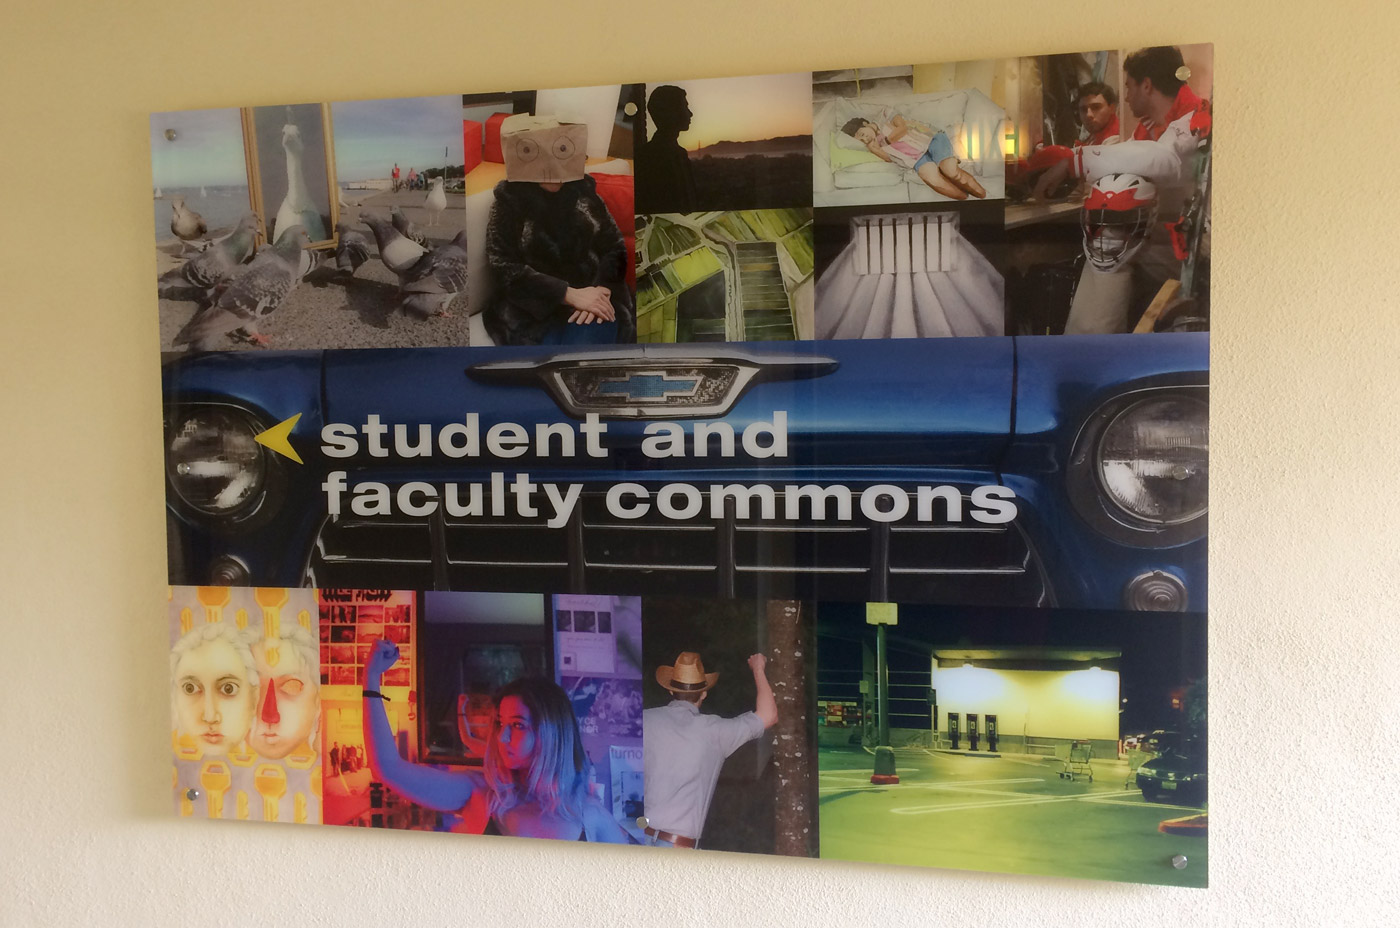 University High School Environmental Signage